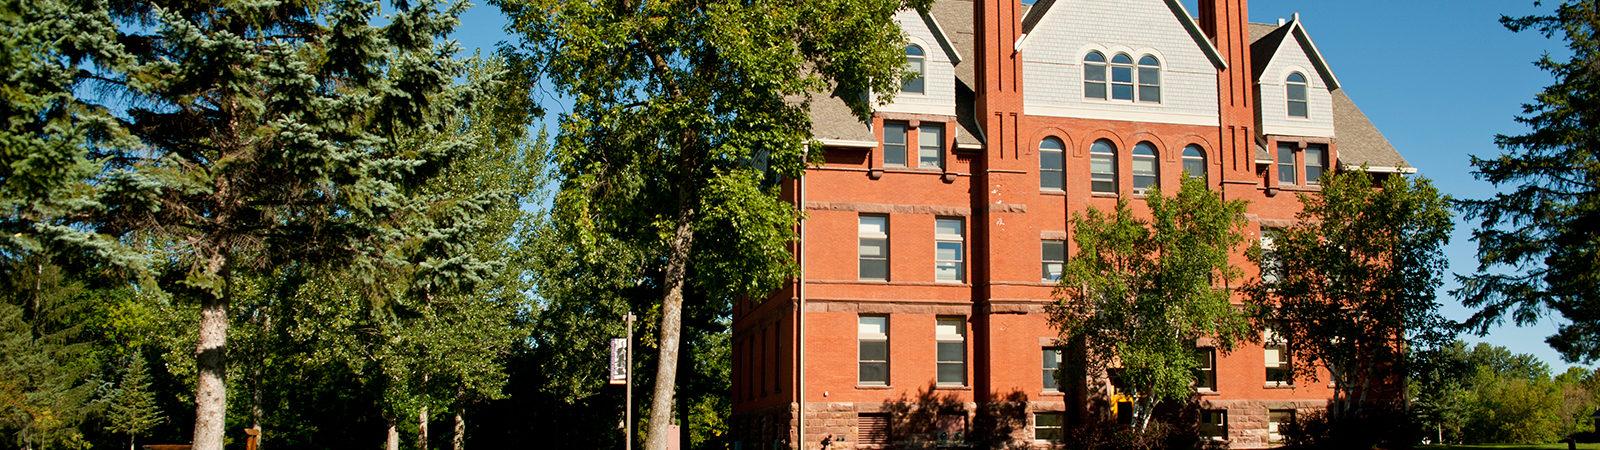 Wheeler Hall building on campus